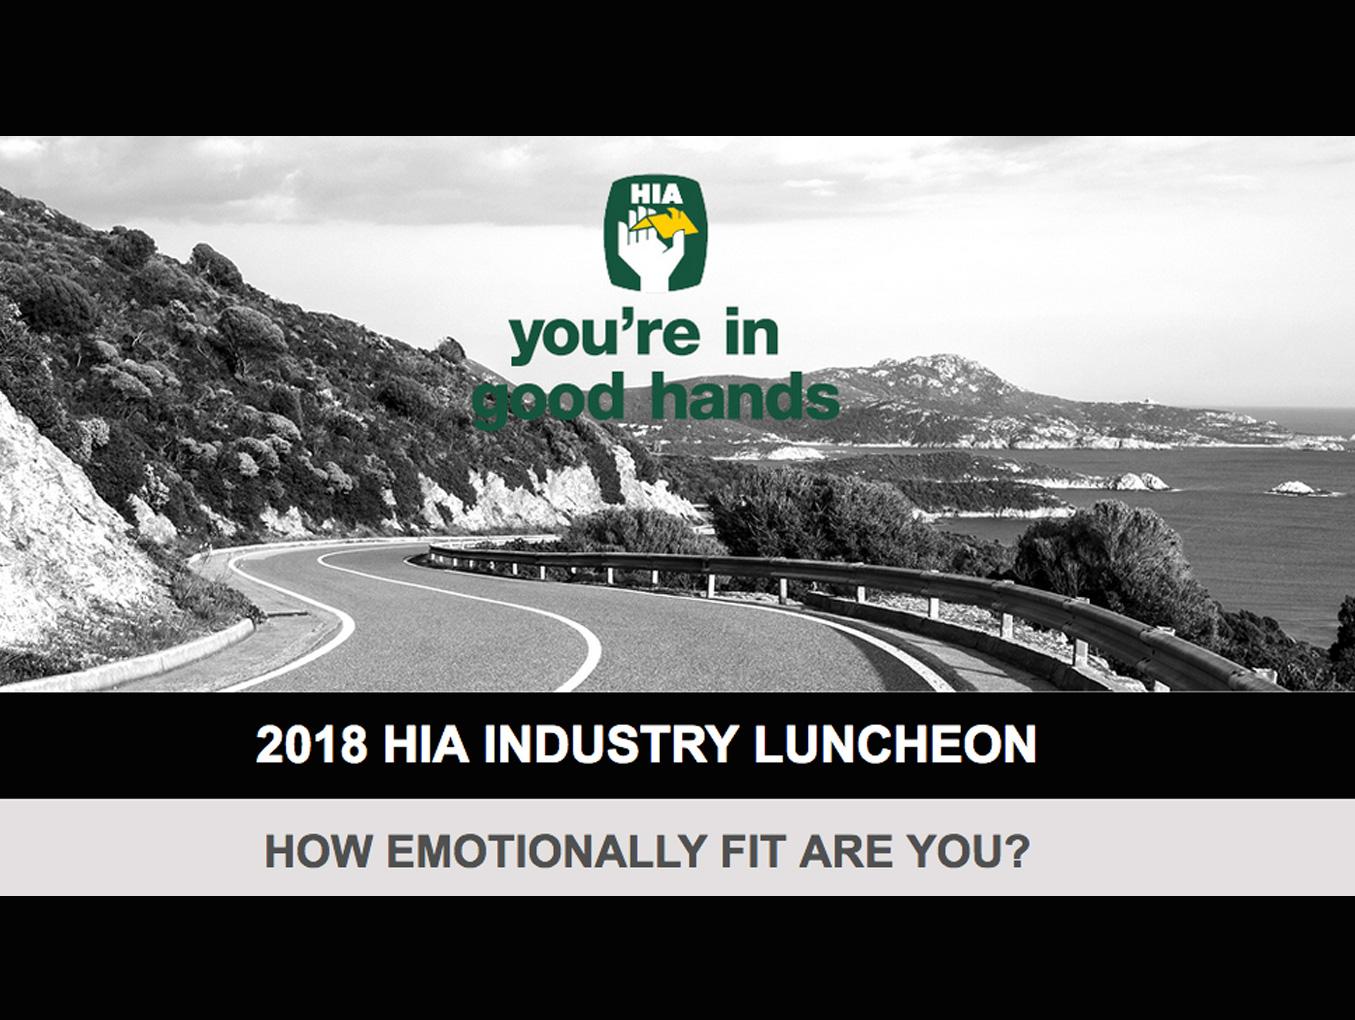 2018 HIA INDUSTRY LUNCHEON - 16/11/18